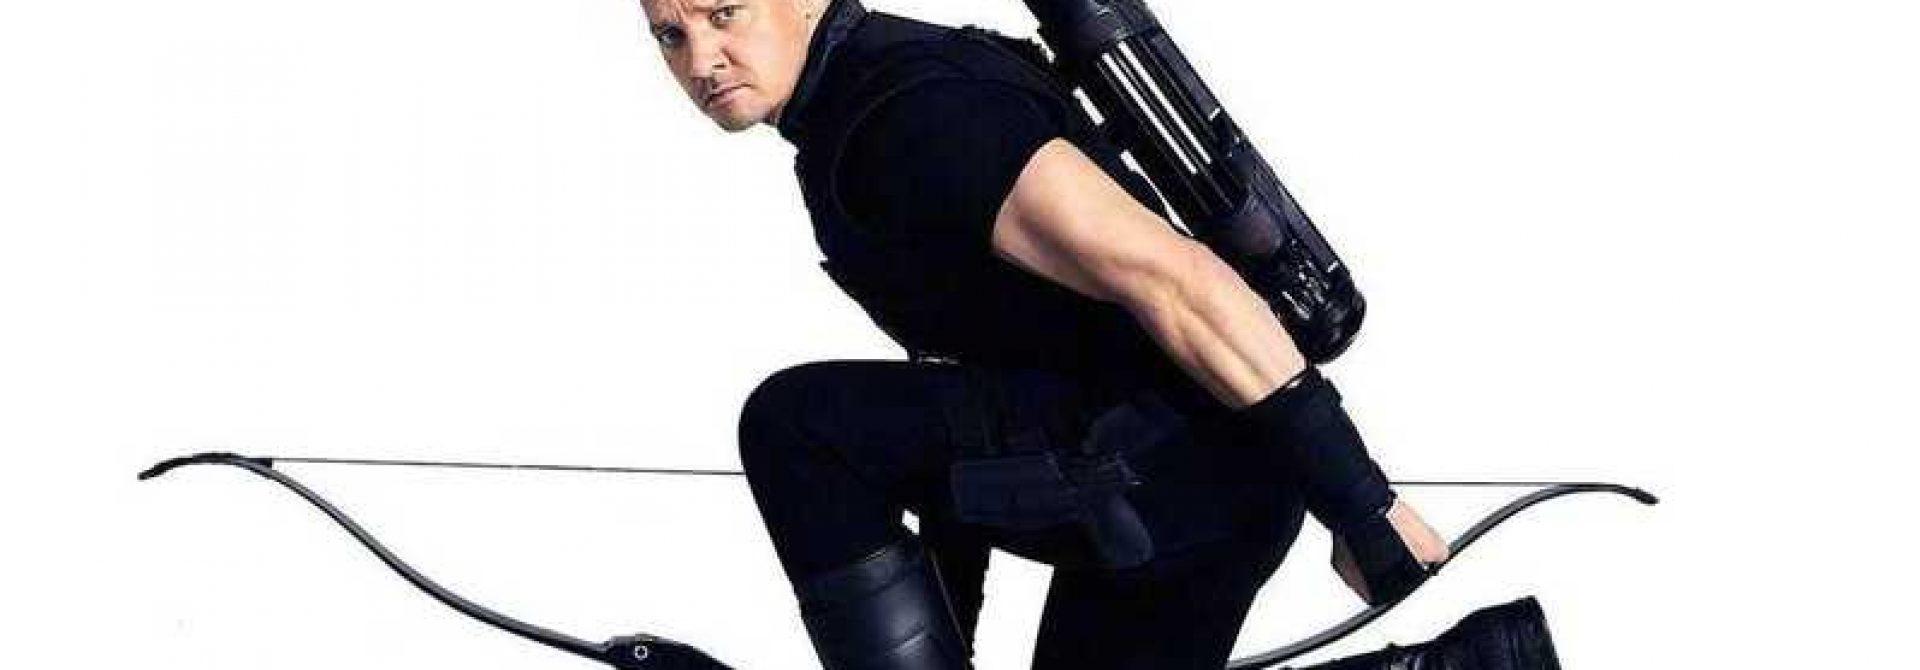 Hawkeye Series In Development For Disney+